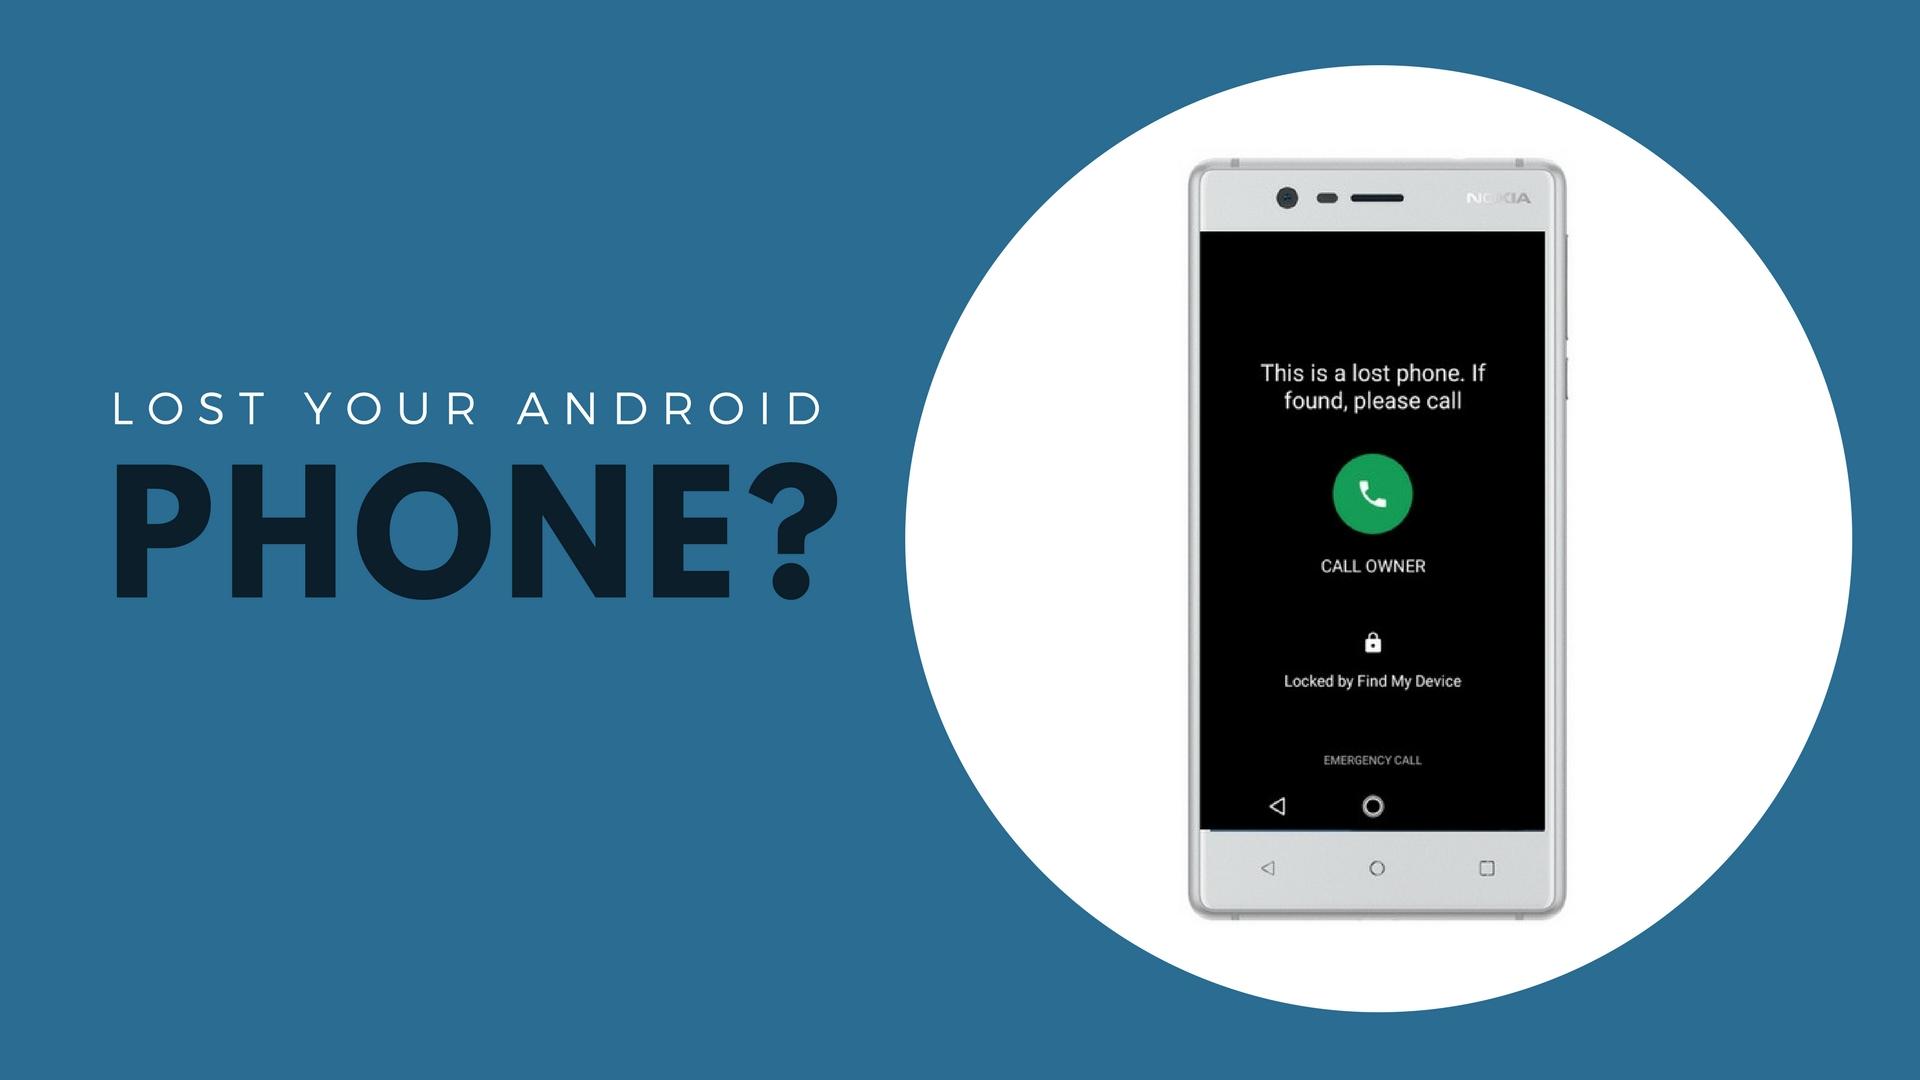 Localizare Telefon Pierdut Android